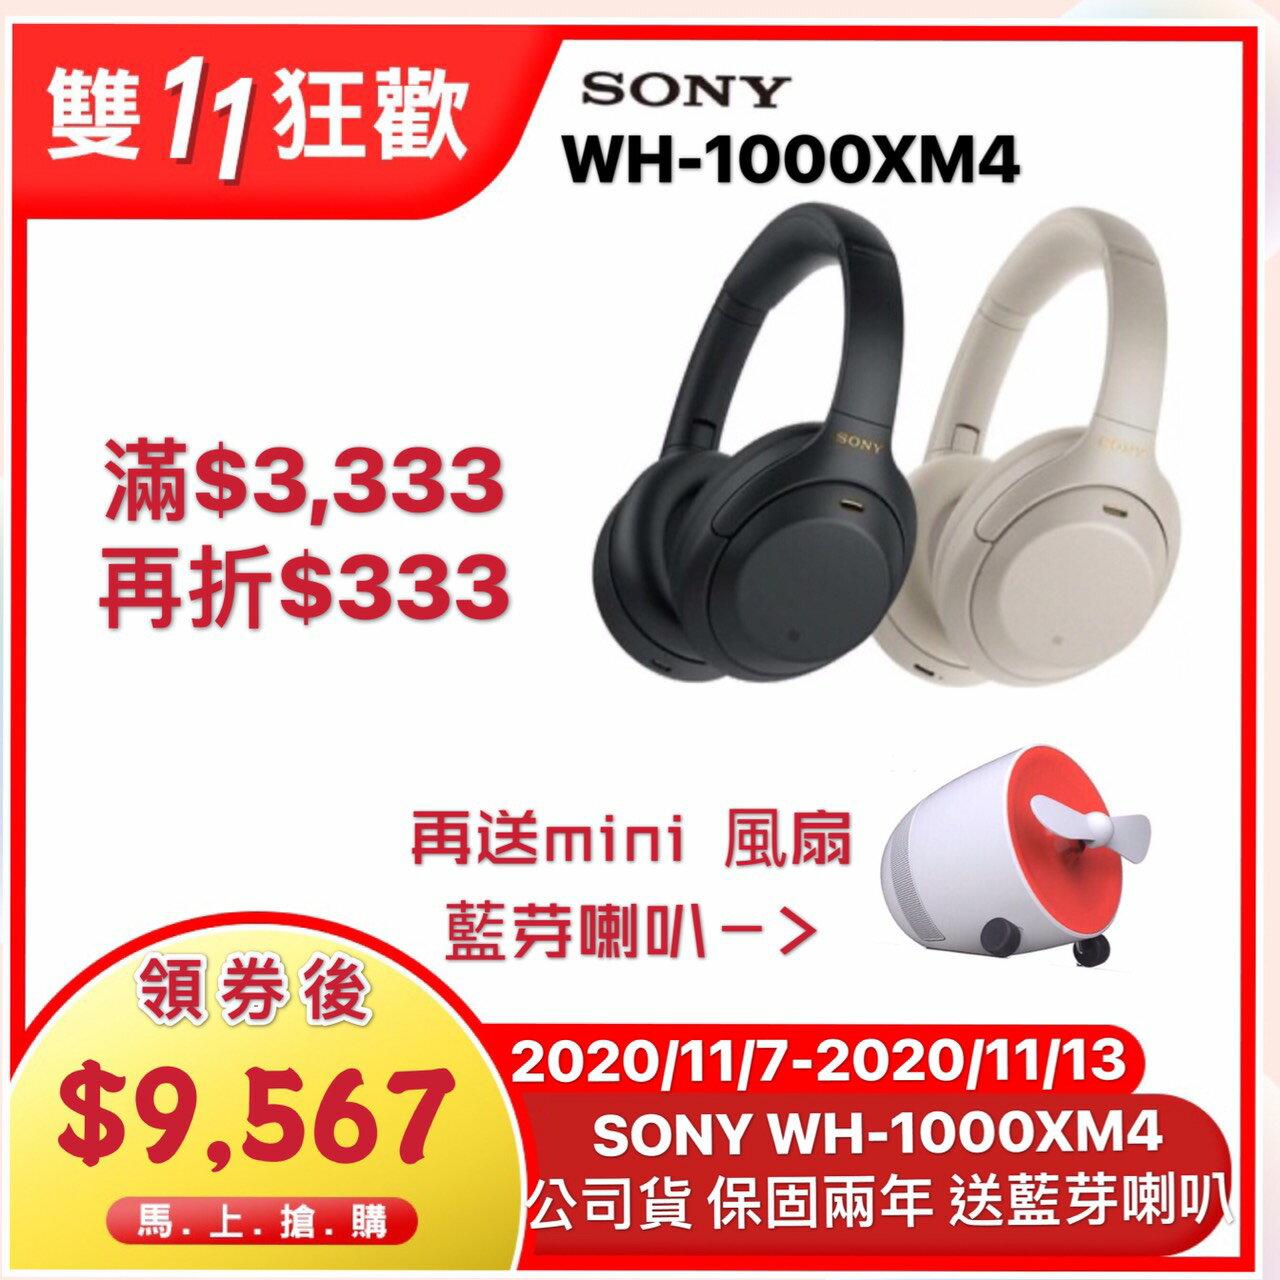 SONY WH-1000XM4 耳罩式 無線降噪耳機 公司貨 再送藍芽喇叭 [富廉網]